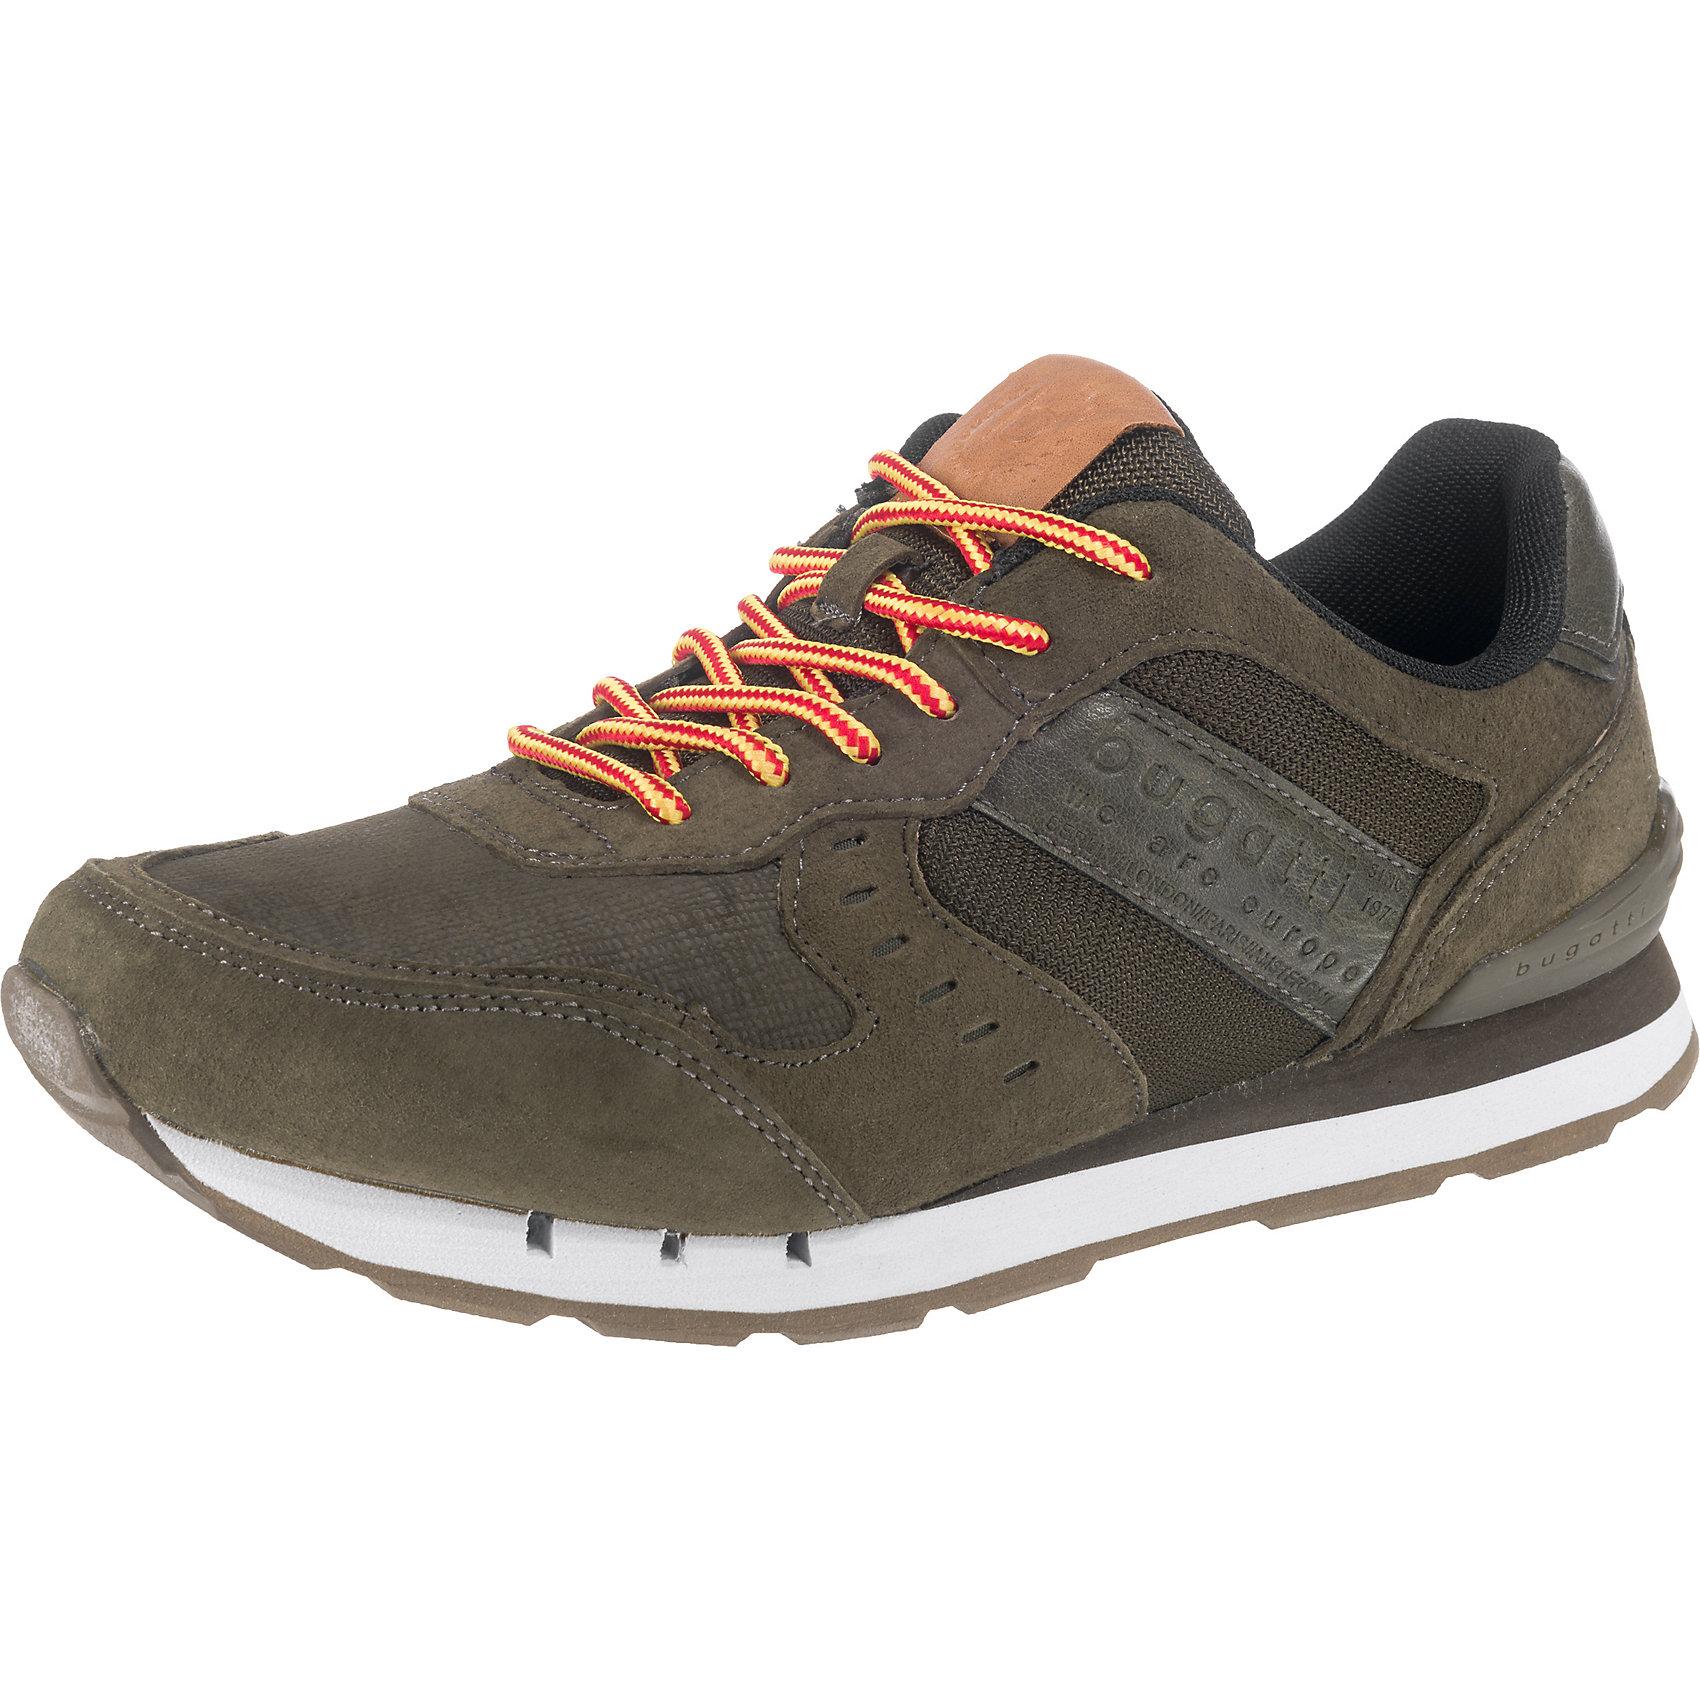 Neu bugatti Sneakers 7029354 für Herren dunkelgrün   eBay 802592699d